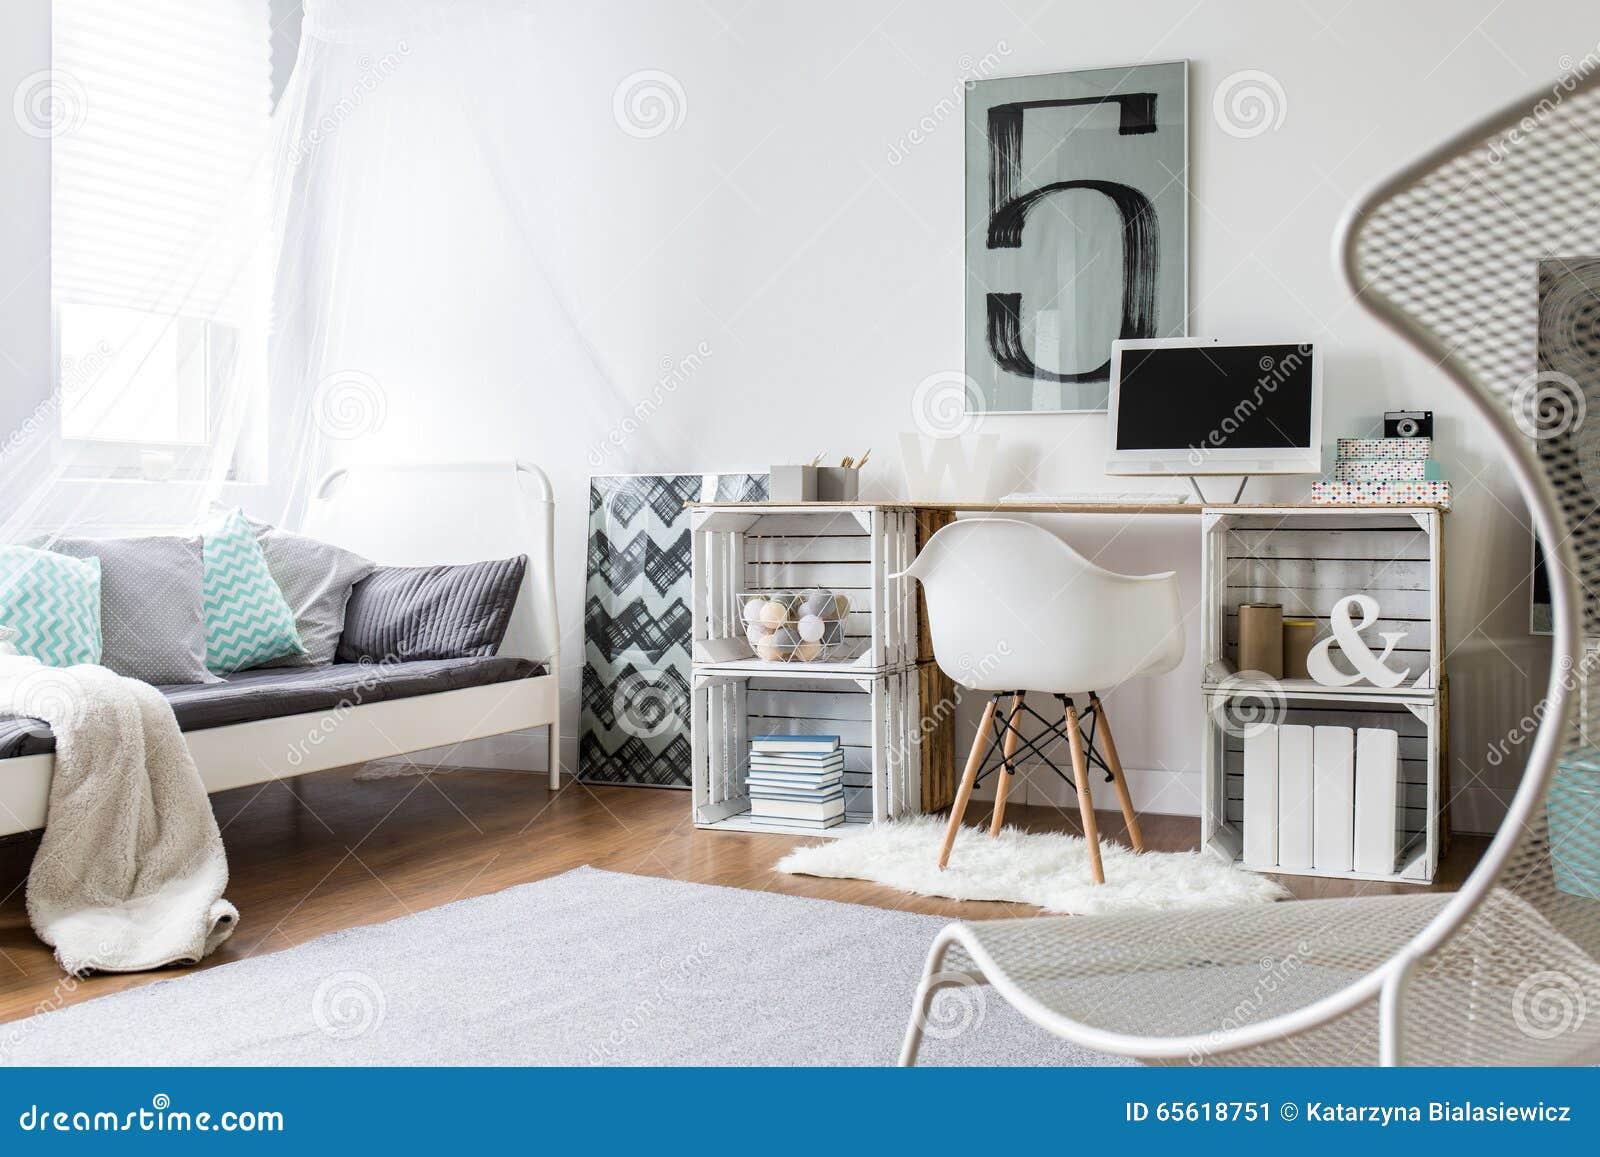 diy desk in stylish room stock image image of style. Black Bedroom Furniture Sets. Home Design Ideas